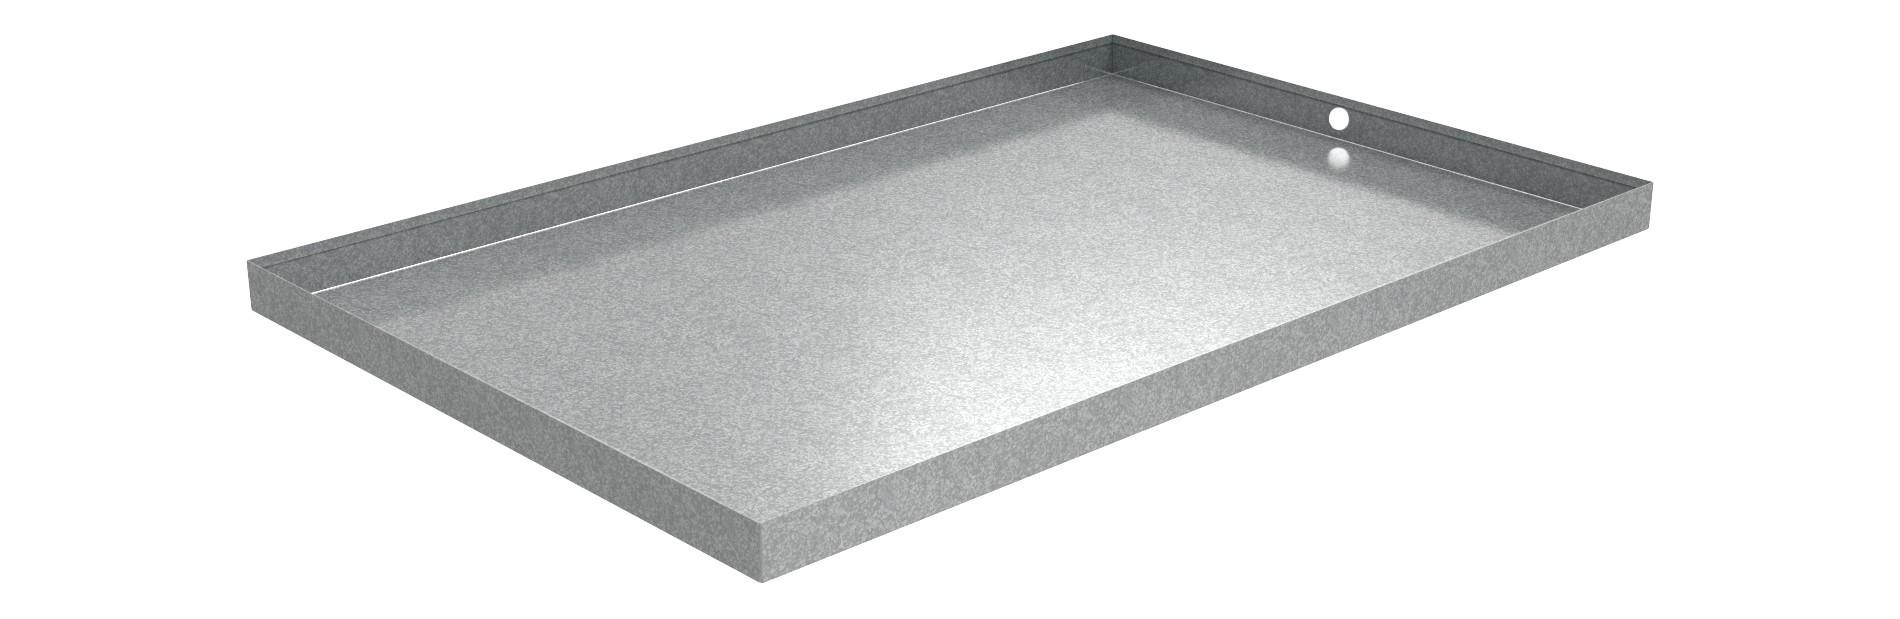 Galvanized Steel Drip Pans Killarney Metals